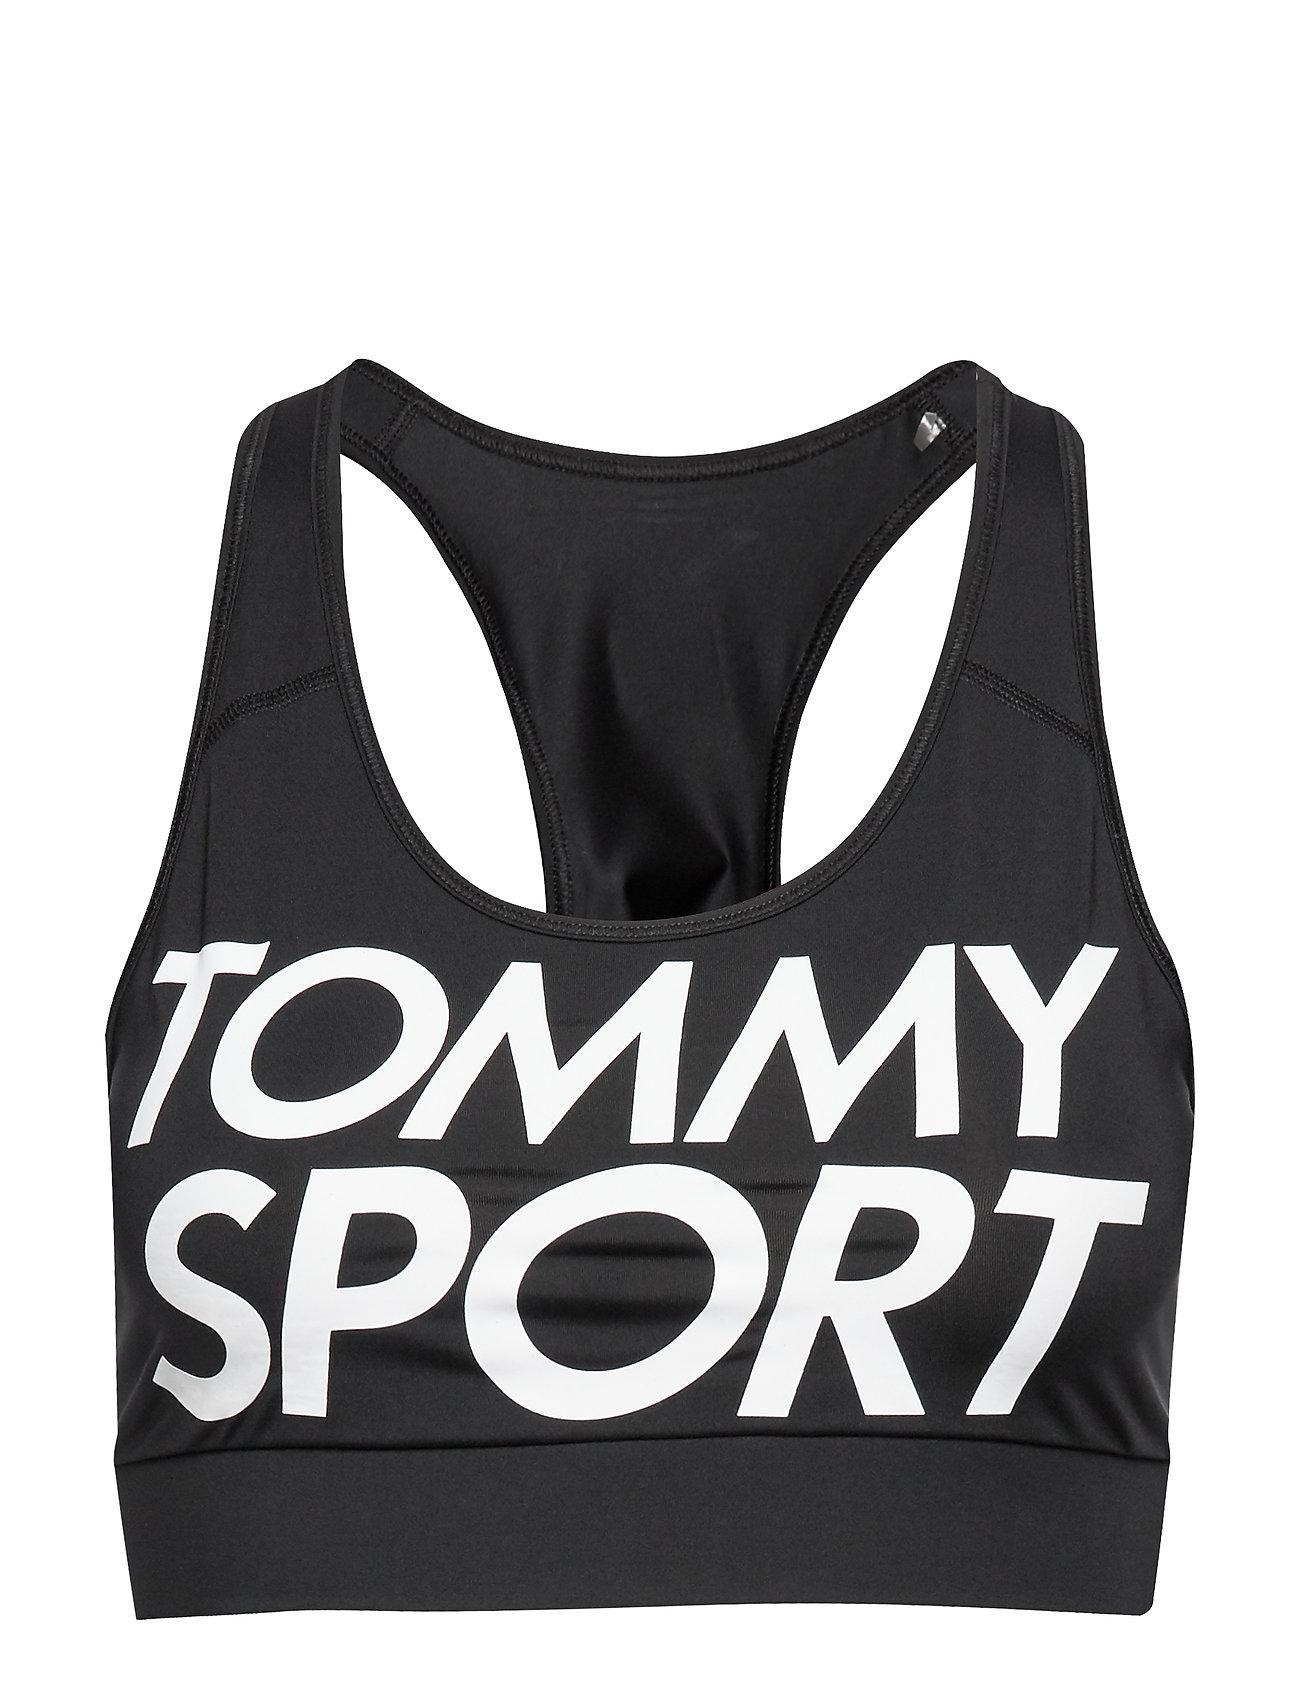 Image of Sports Bra Logo Mid Lingerie Bras & Tops Sports Bras - ALL Sort Tommy Sport (3279932239)